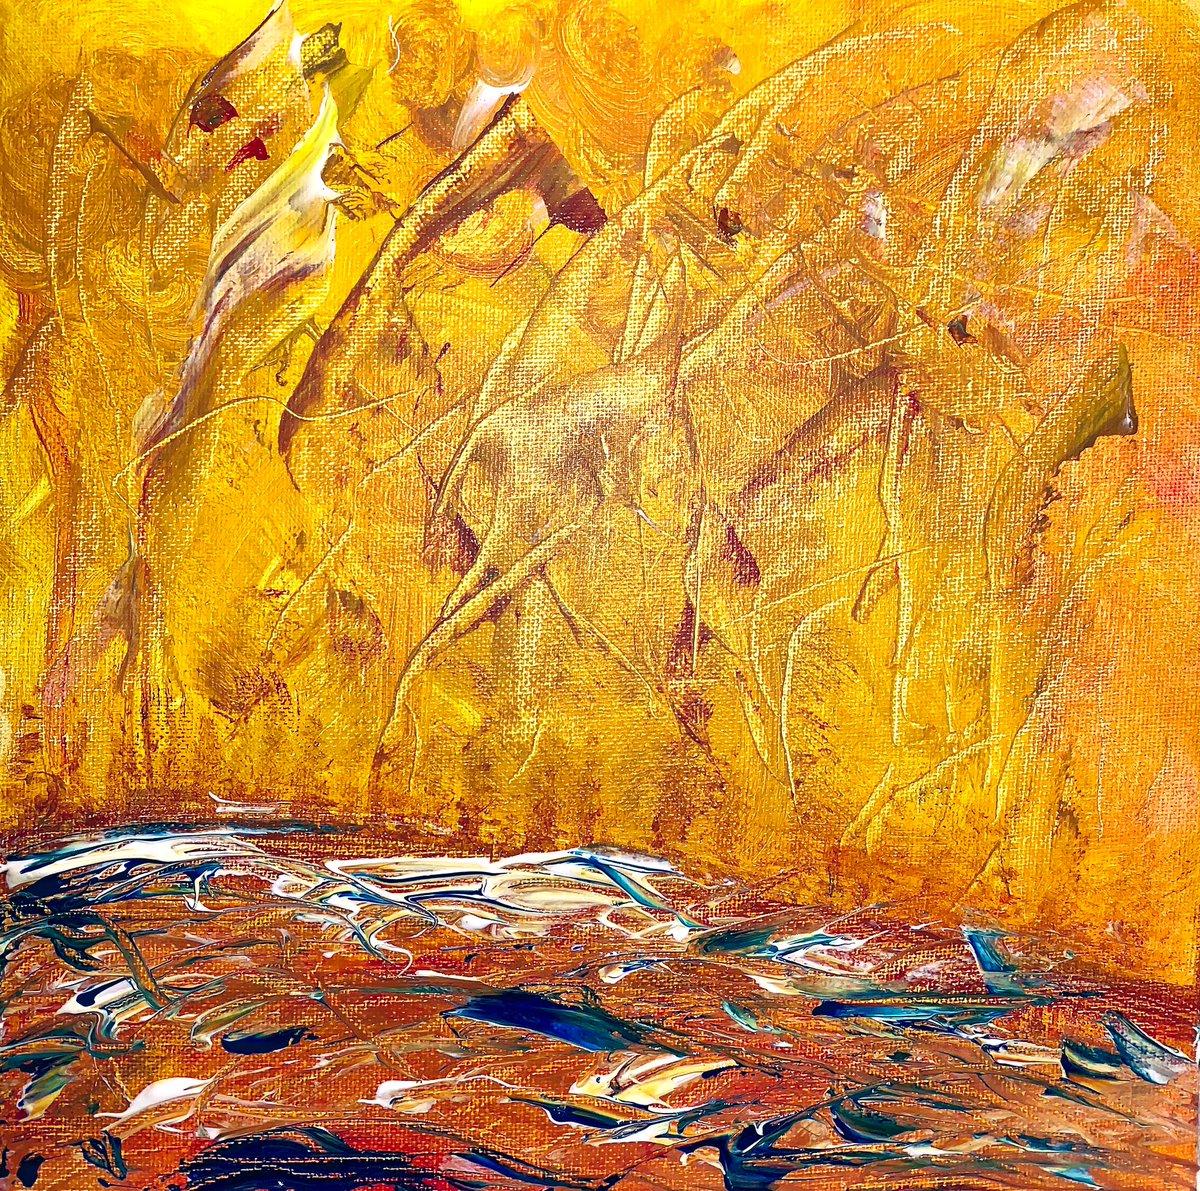 ✨Fire Lake✨  10 x 10 acrylic on canvas  #painting #abstractpainting #abstractart #abstract #painting🎨 #artiseverywhere #artist #artists #artistsofinstagram #artistsoninstagram #artistsofinsta #acrylicpainting #acrylic #art #nature #austin #austinartist #atx #impressionism